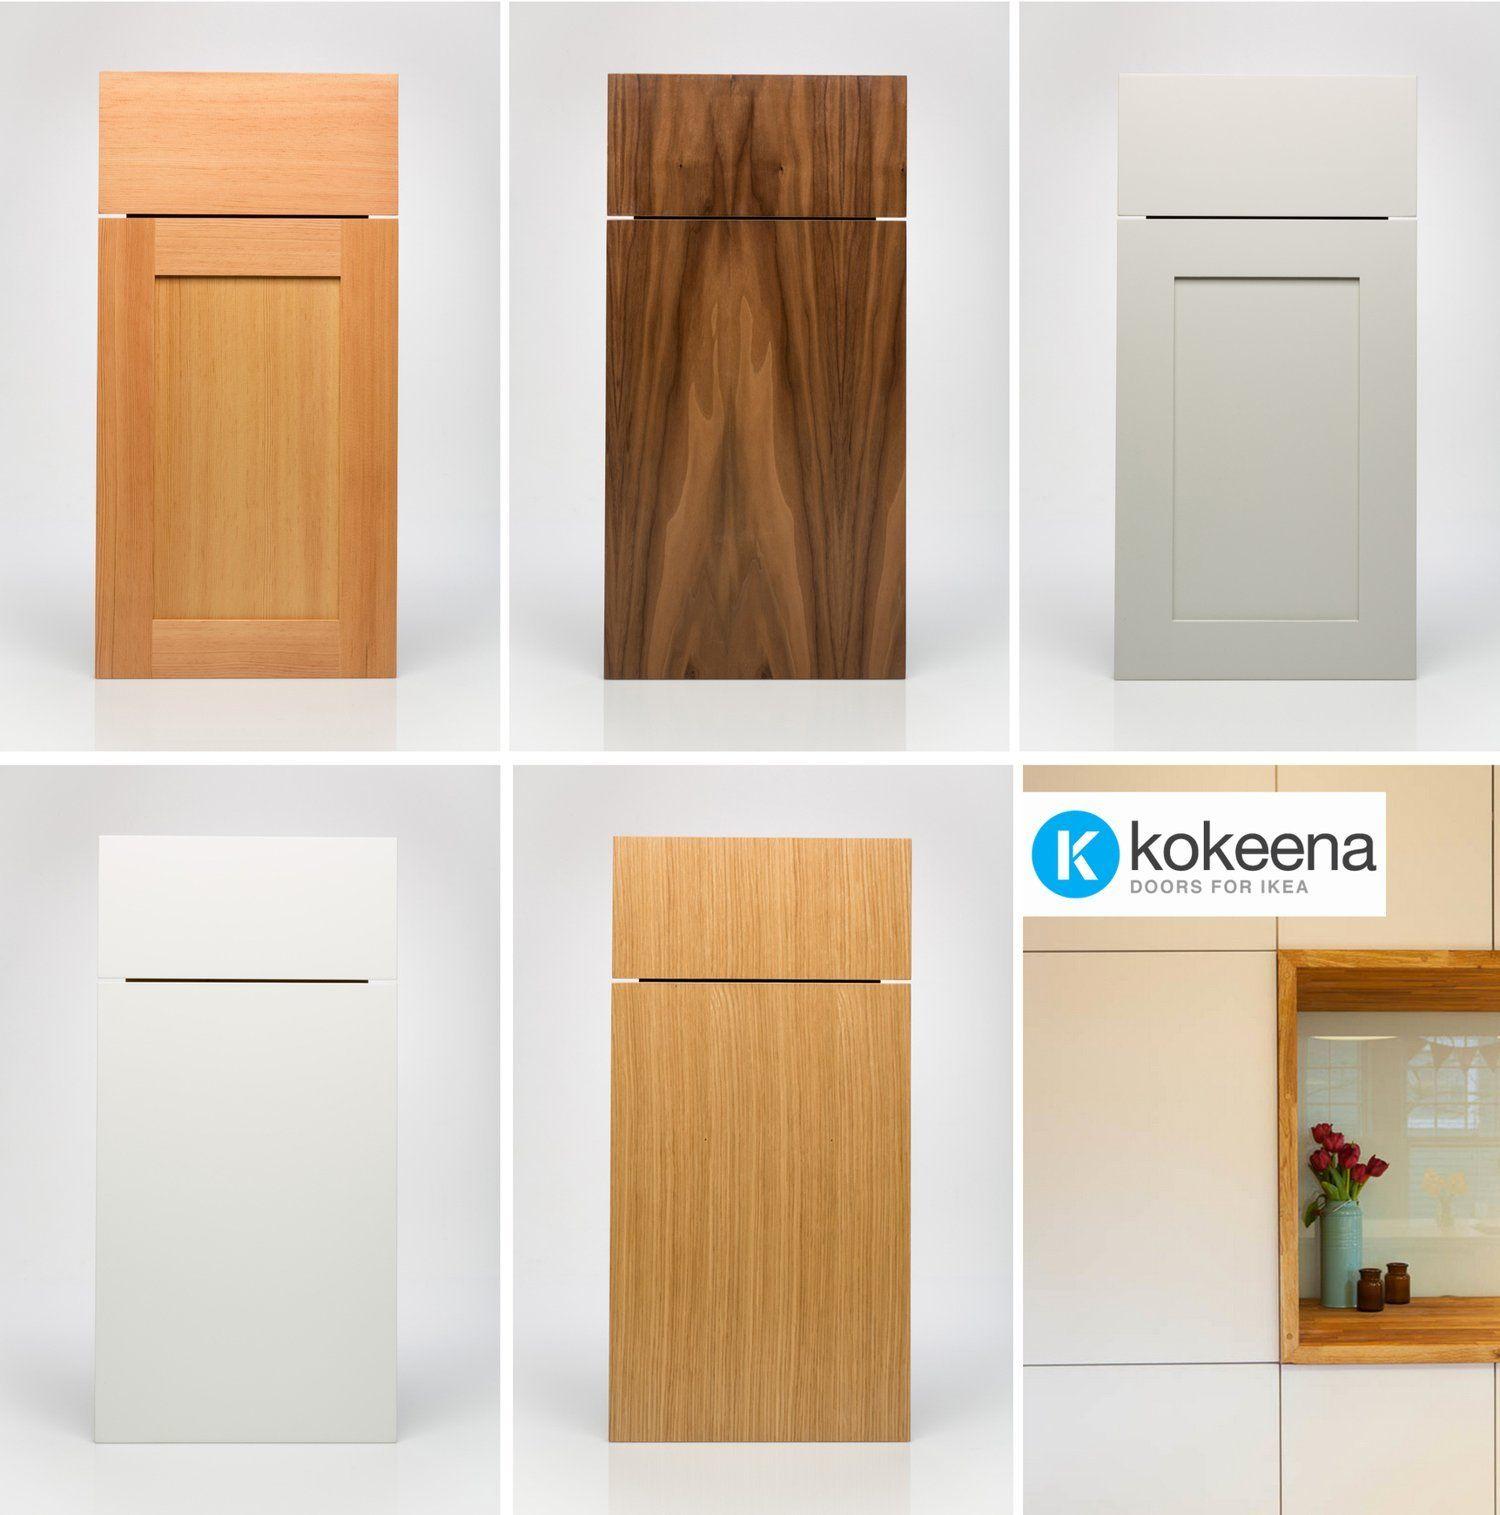 pre painted kitchen cabinet doors oak kitchen cabinet doors Kokeena Real Wood Ready Made Cabinet Doors for IKEA AKURUM Kitchens Store Profile